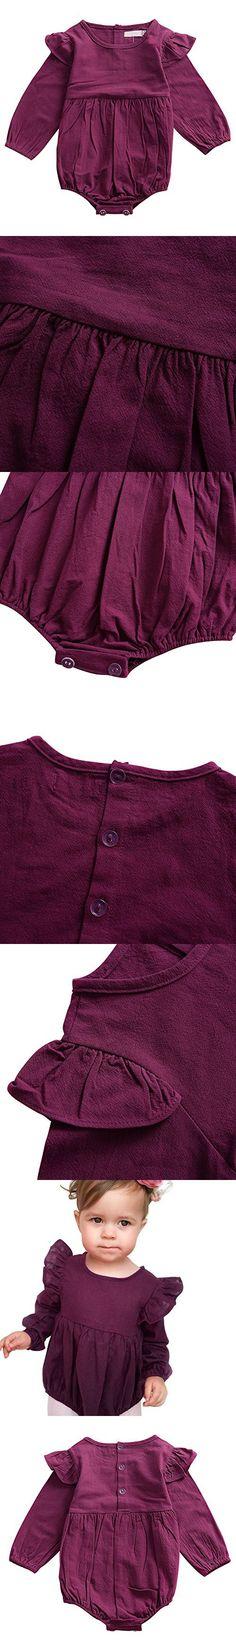 585d482cb99 Hadari Women s Plus Size Long Sleeve Short Bodycon Romper